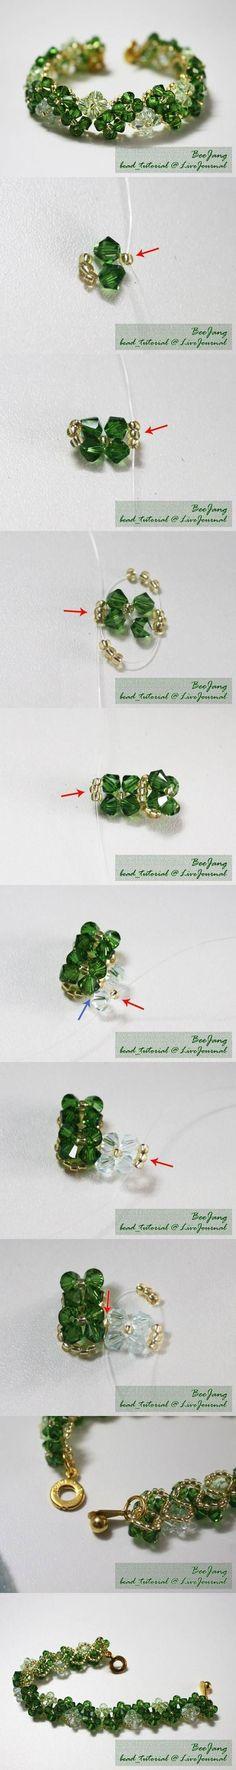 DIY Transparent Beads Bracelet by Jersica